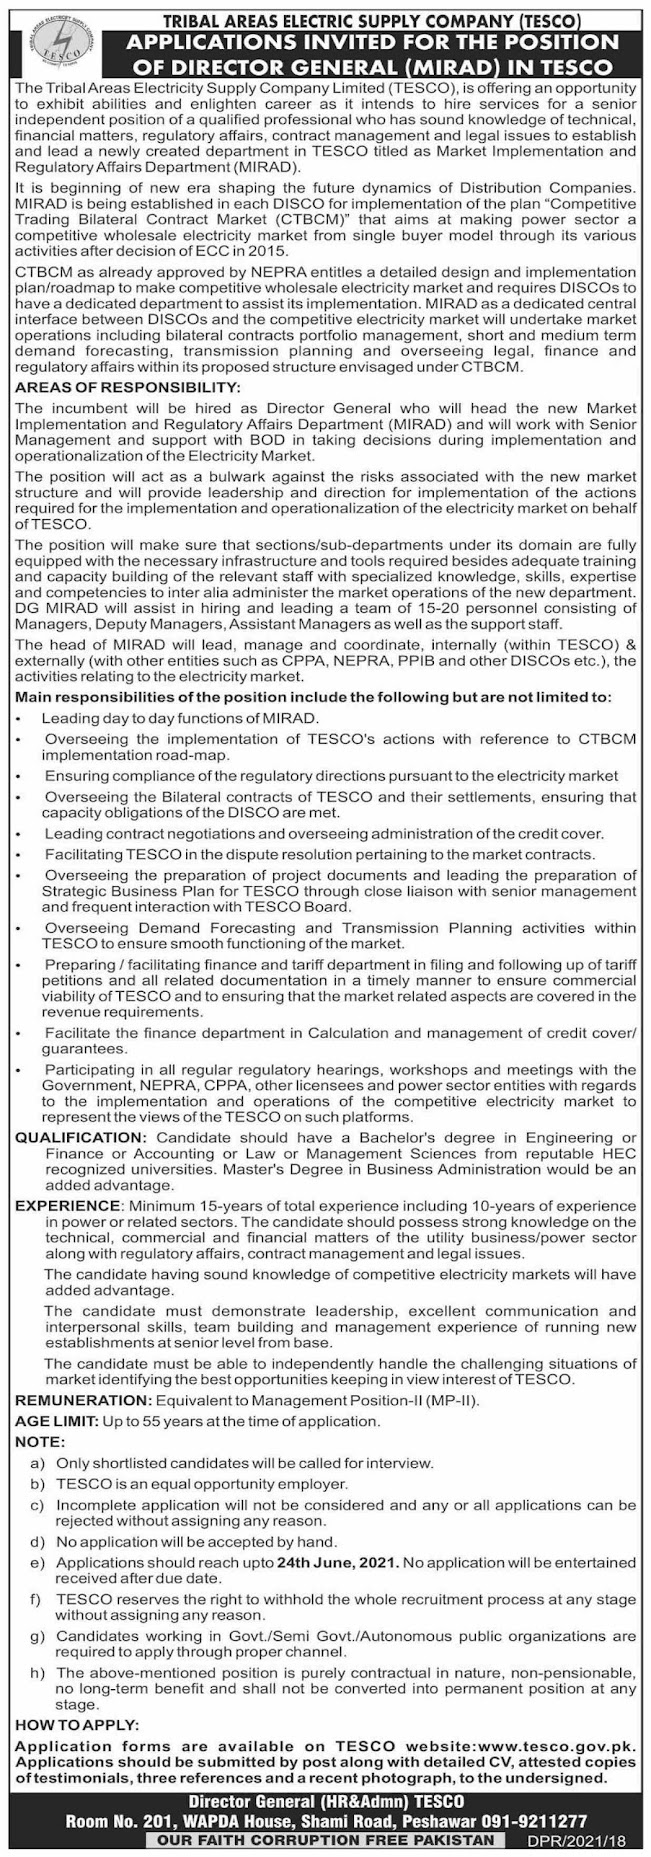 Director General TESCO | Newspaper Jobs